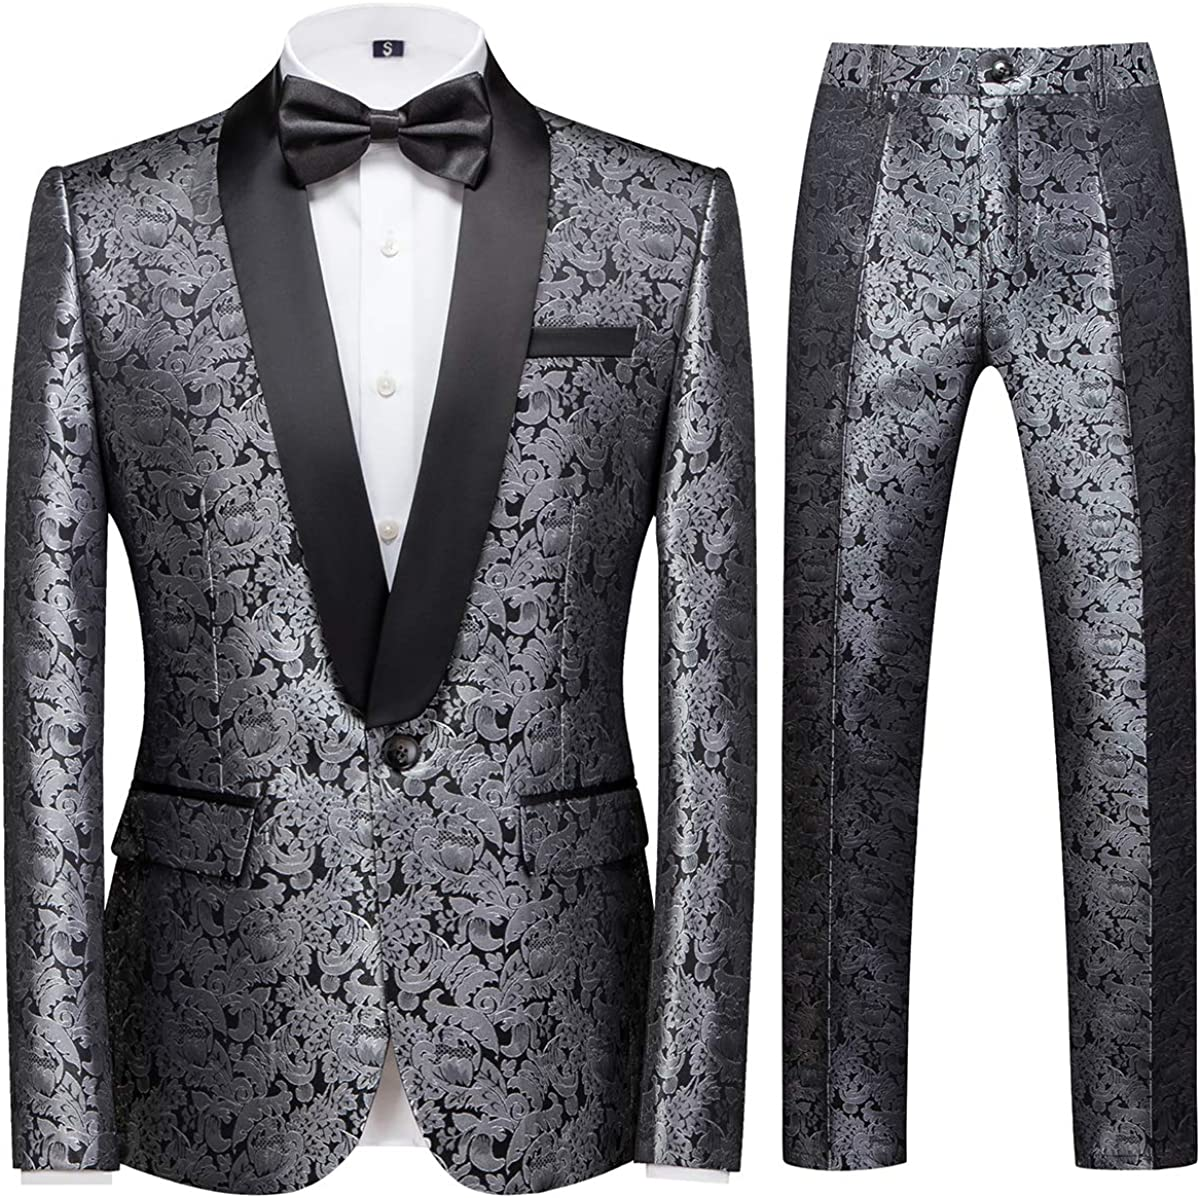 YFFUSHI Mens 2 Piece Suits Embroidery Shawl Collar Prom Party Wedding Blazer Jacket Trouser